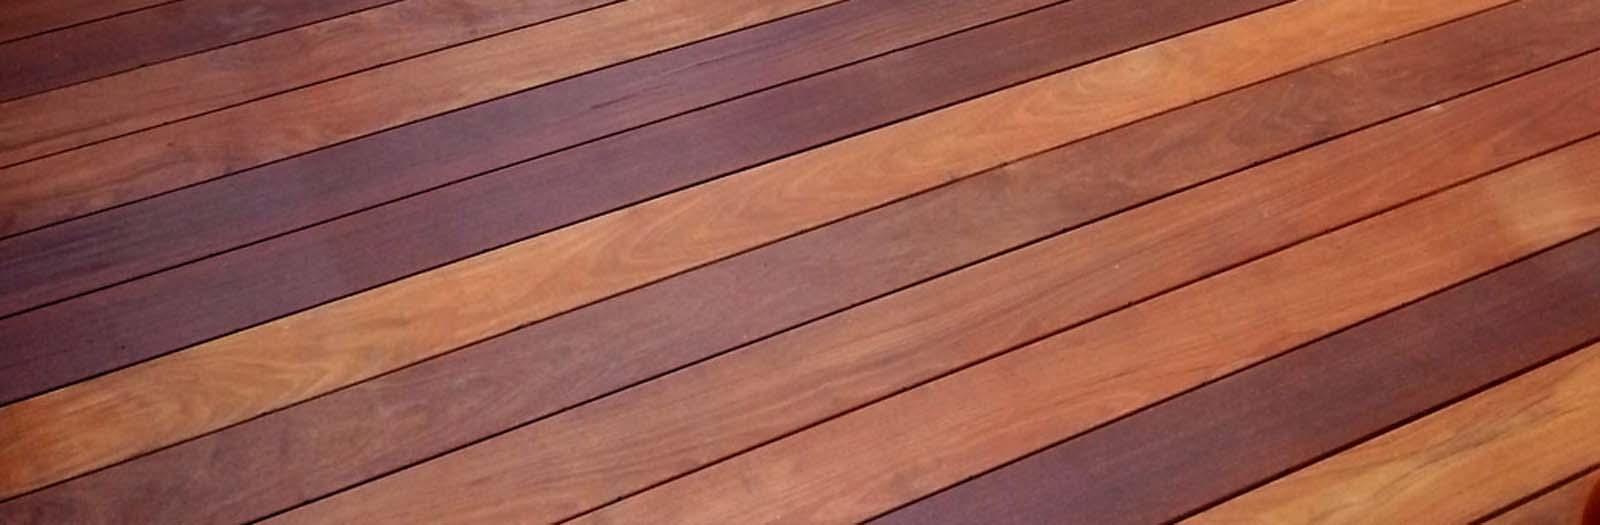 brazilian hardwood decking   interior trim u0026 supply QEVOYVS